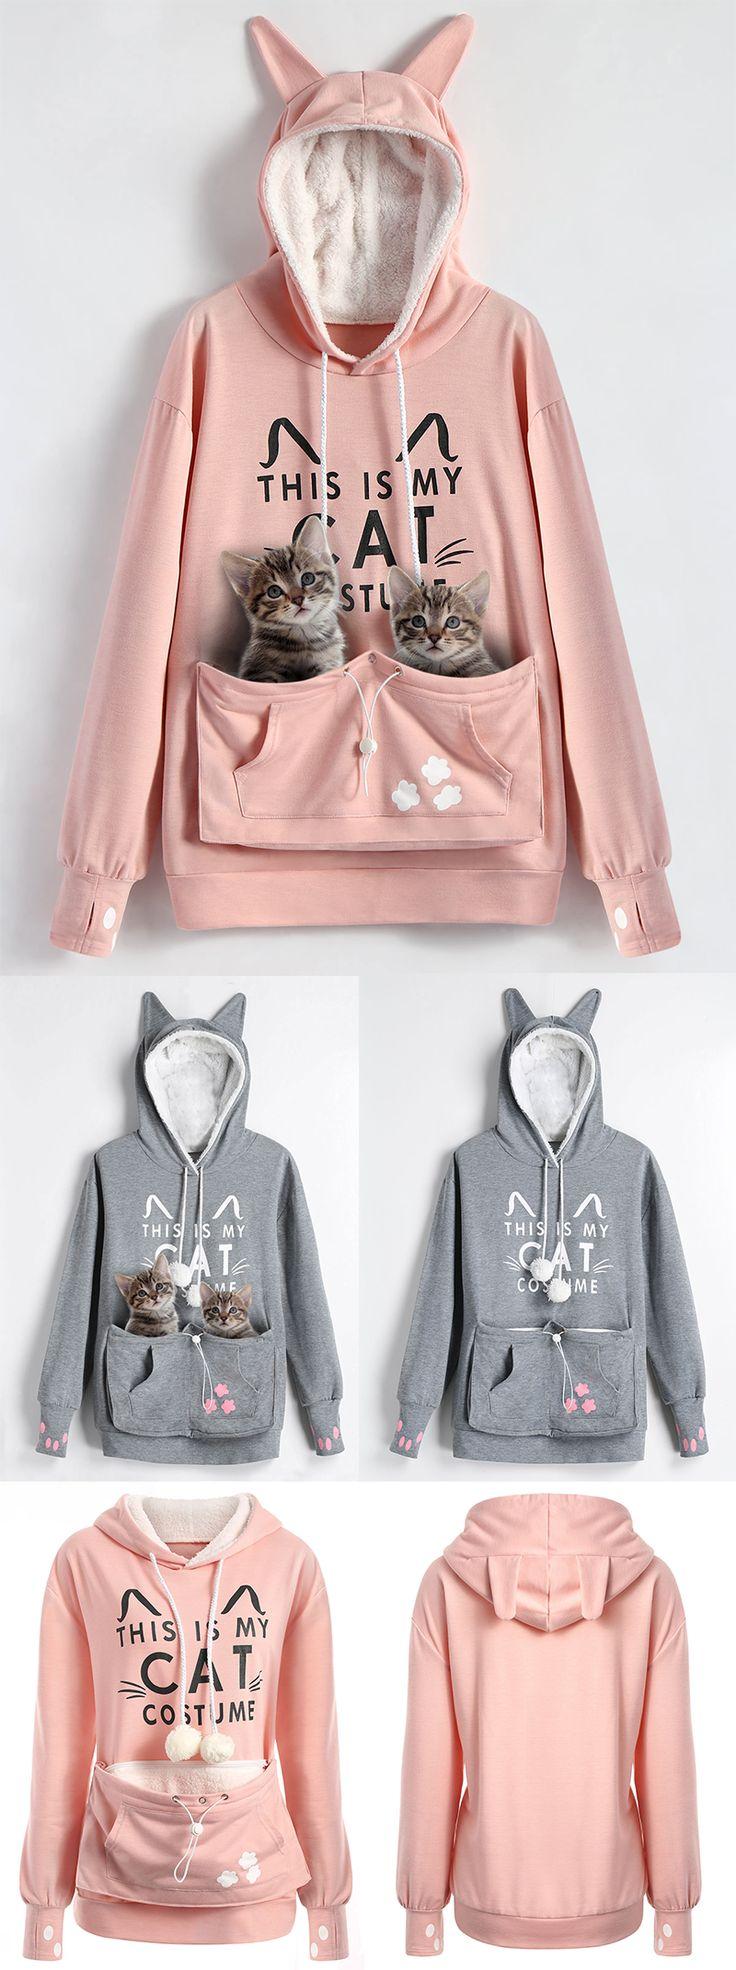 Plus Size Cat Holder Pouch Pocket Hoodie | $15.14(was 34.66) | #plussize #womenfashion #hoodie